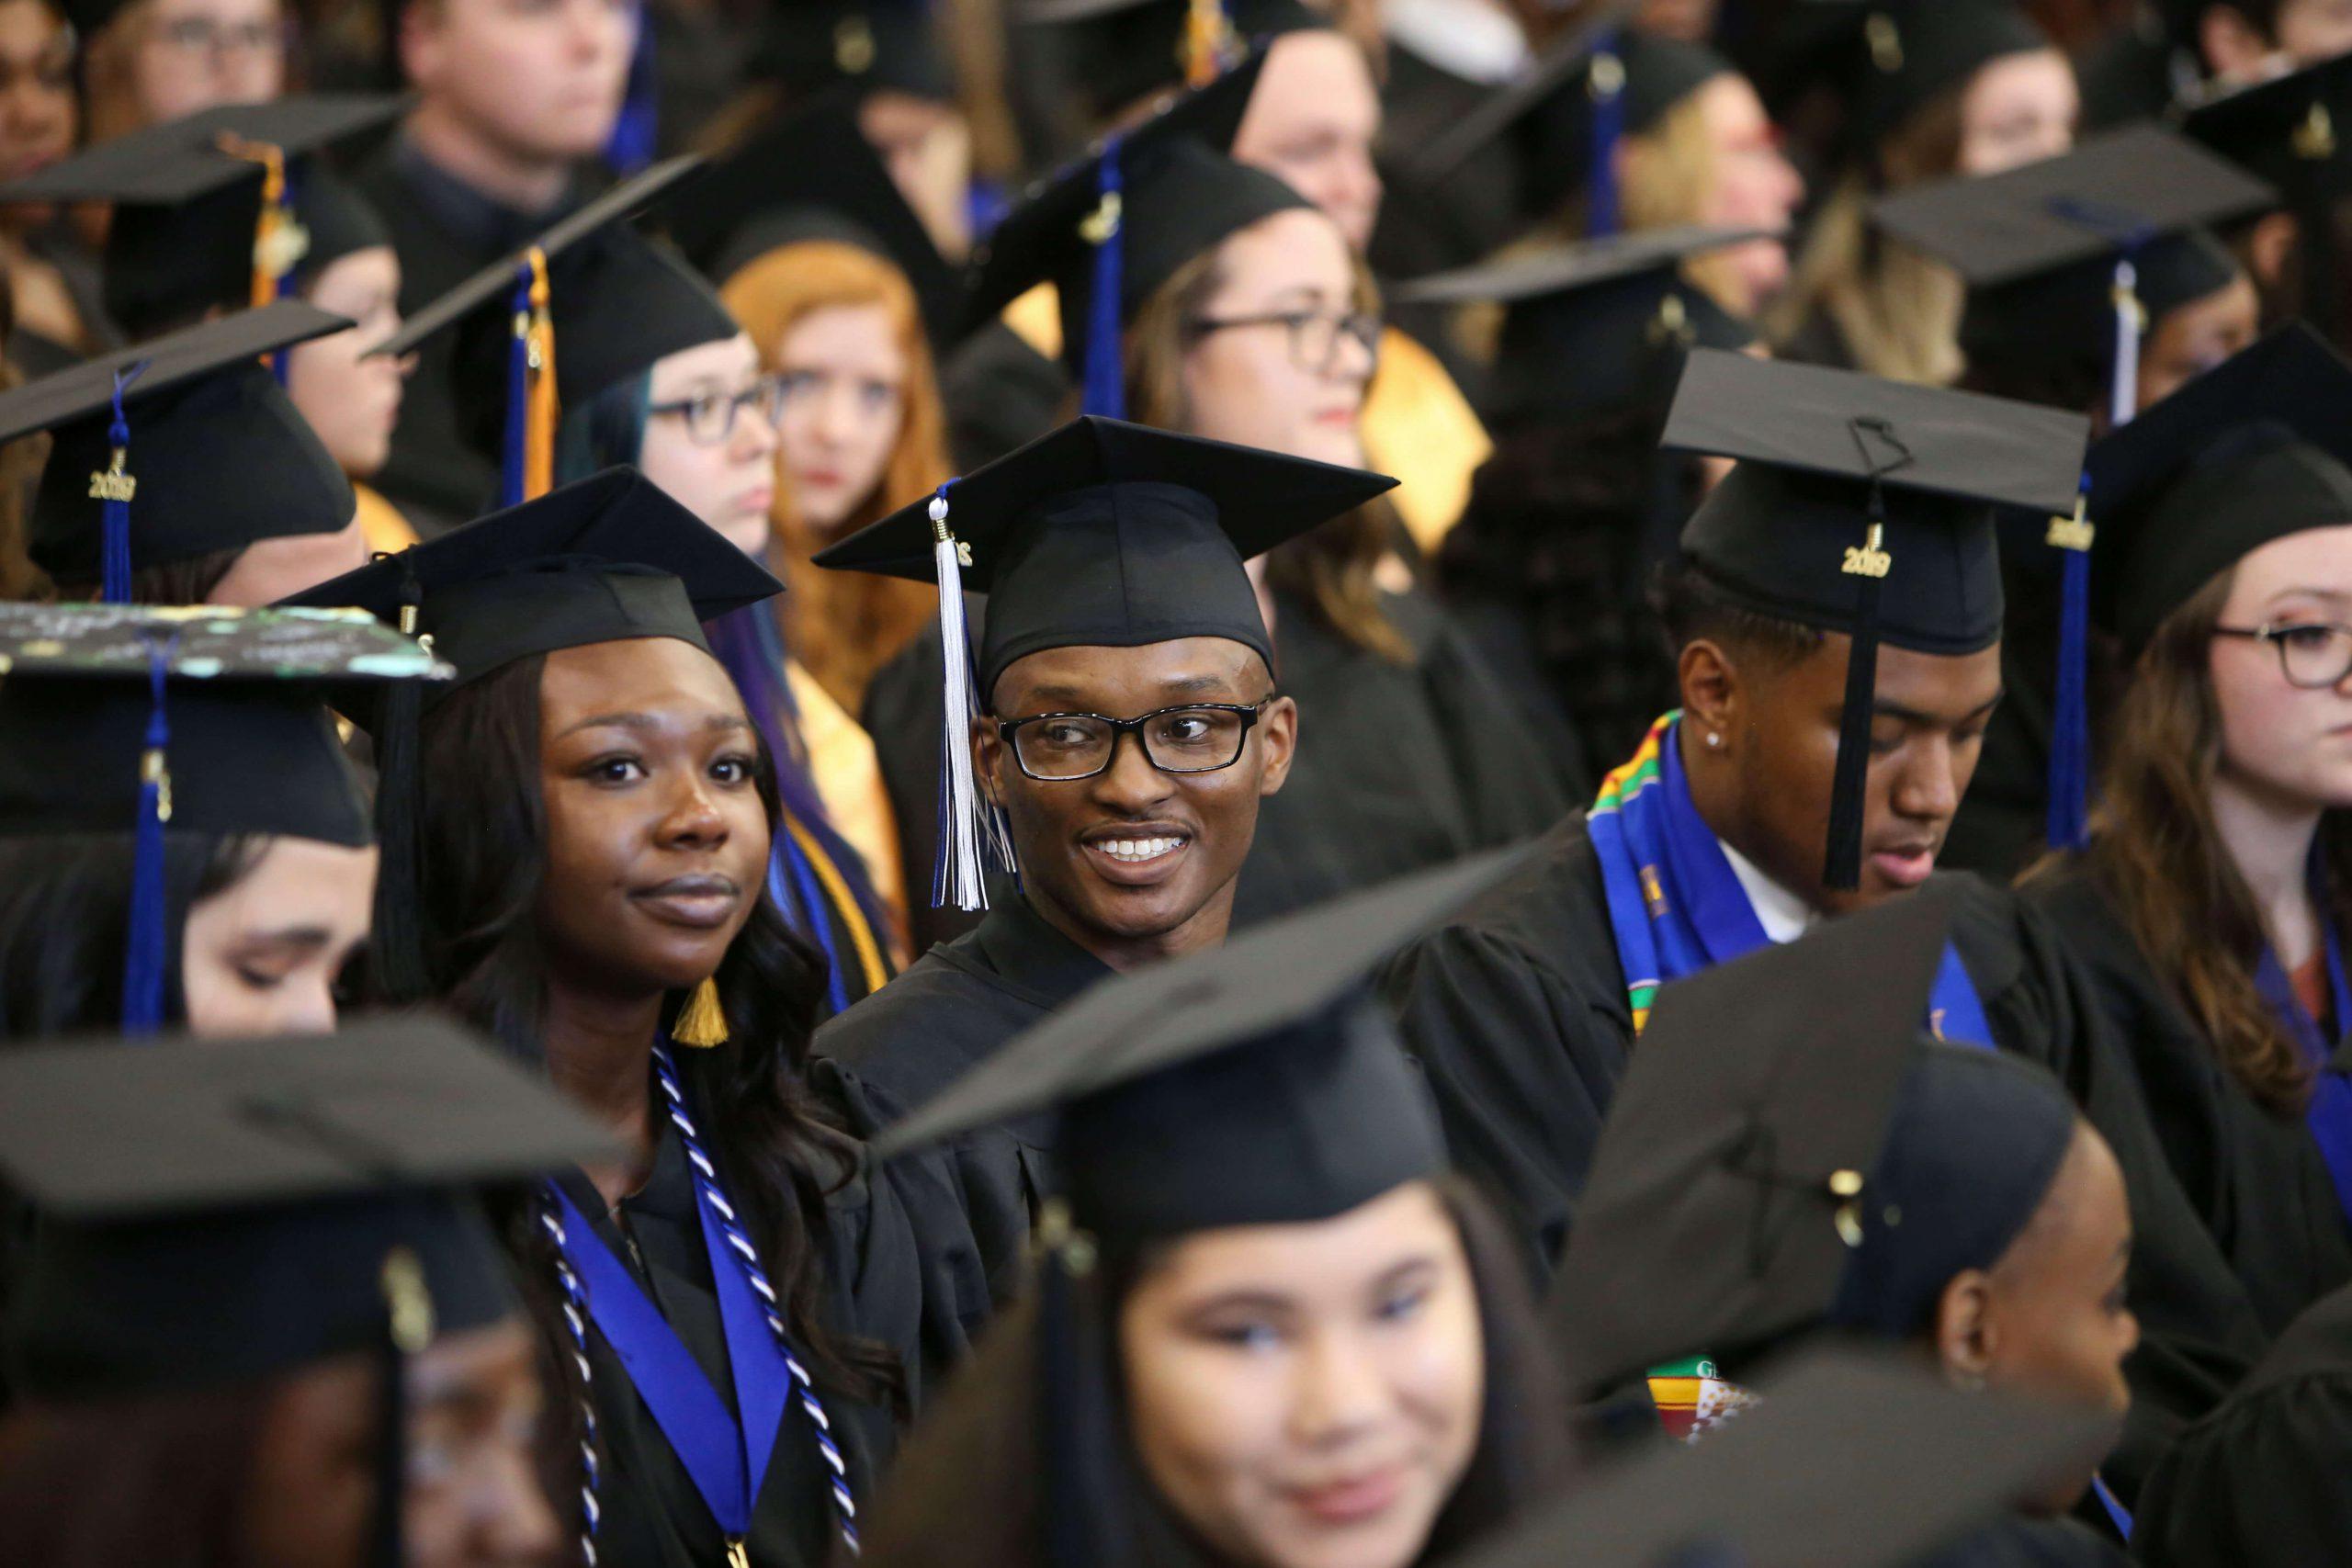 SWIC file photo of Graduation commencement ceremony.